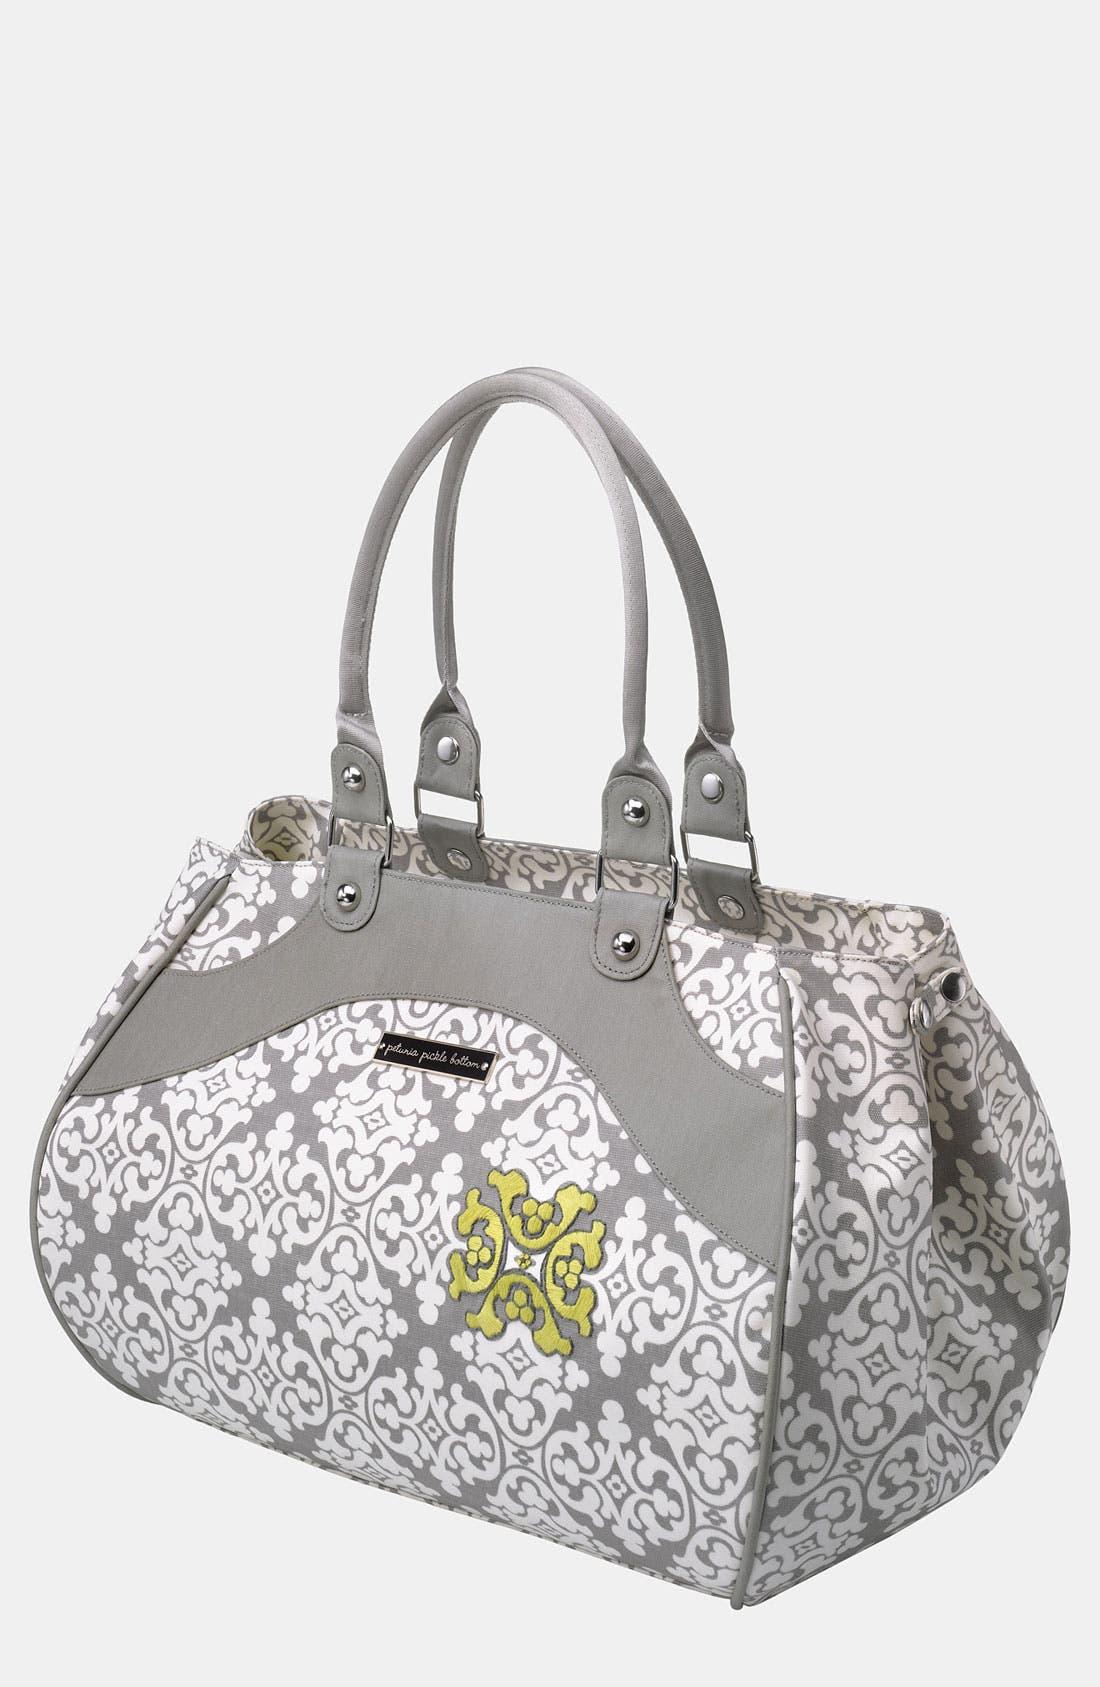 Petunia Pickle Bottom 'Glazed Weekend' Diaper Bag